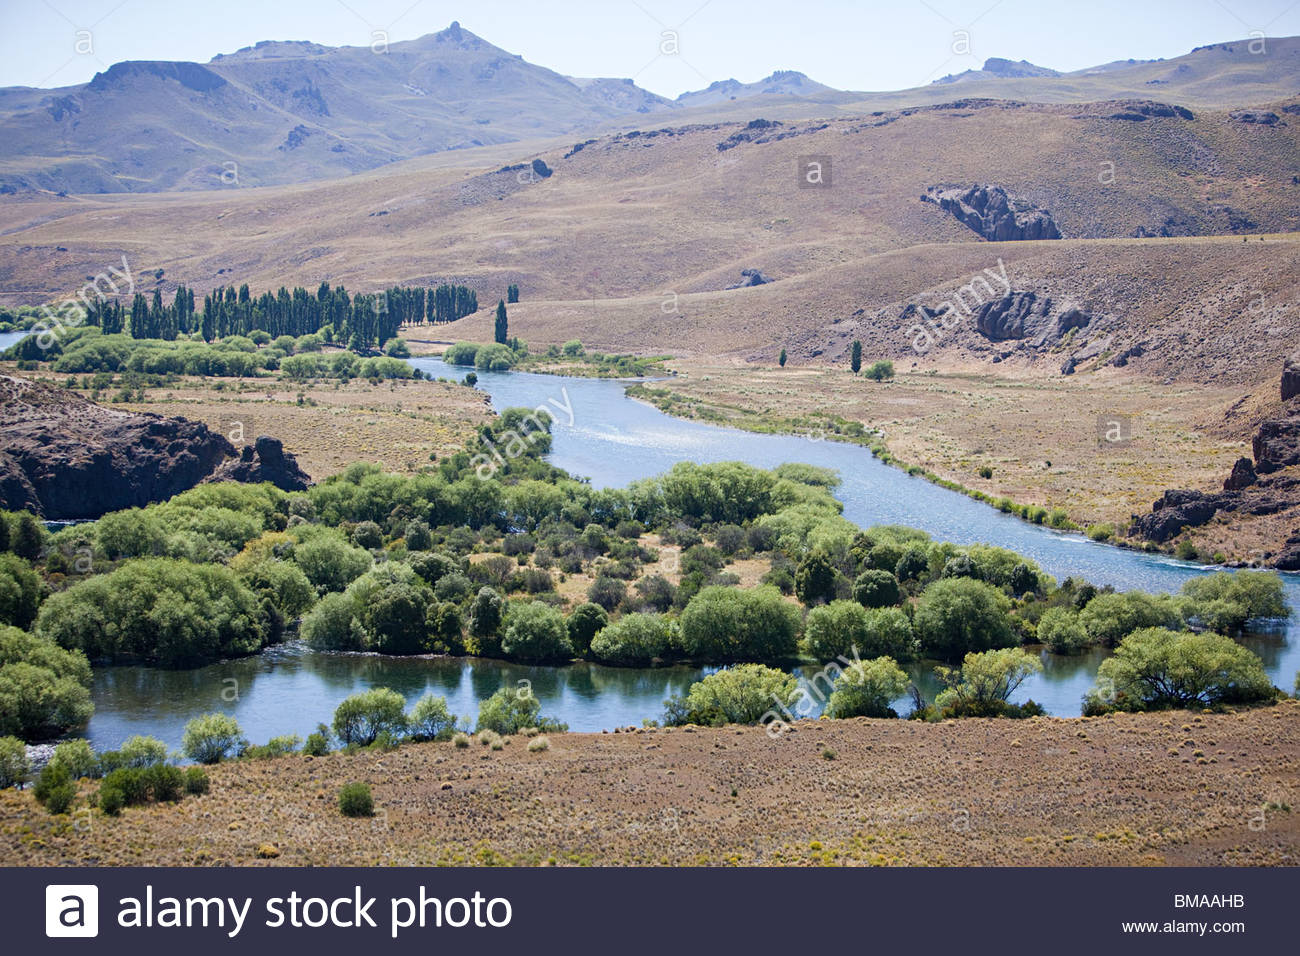 River in valle encantado in argentina - Stock Image